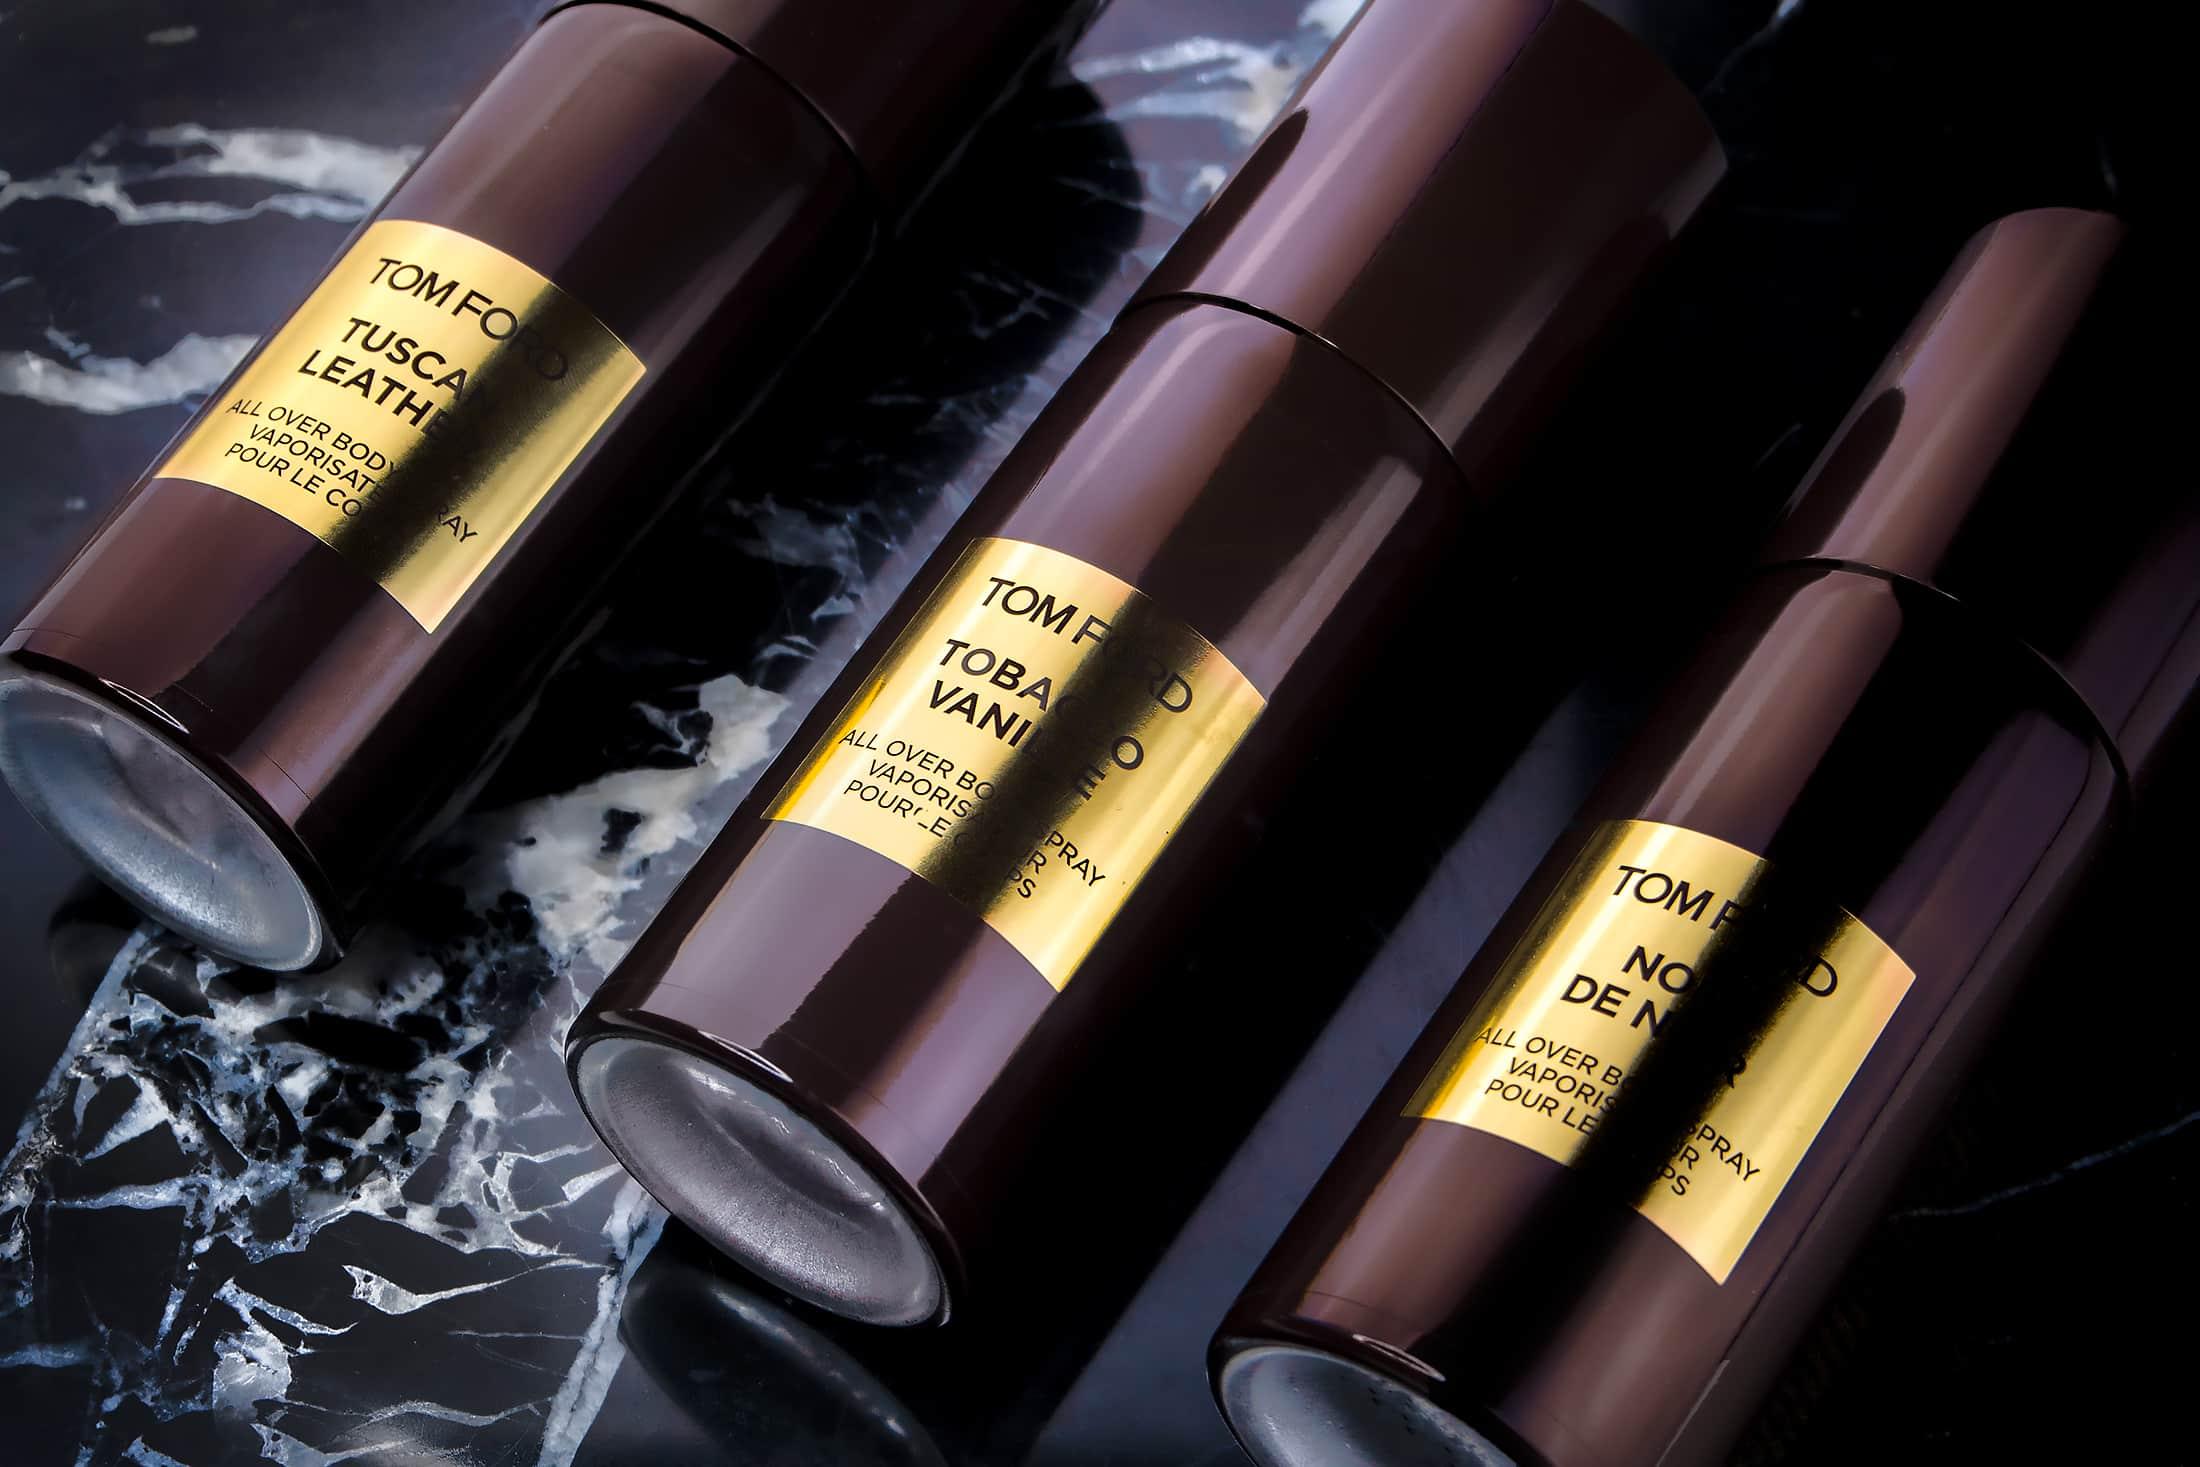 152d723bc3806 TOM FORD Private Blend Body Sprays - MANFACE